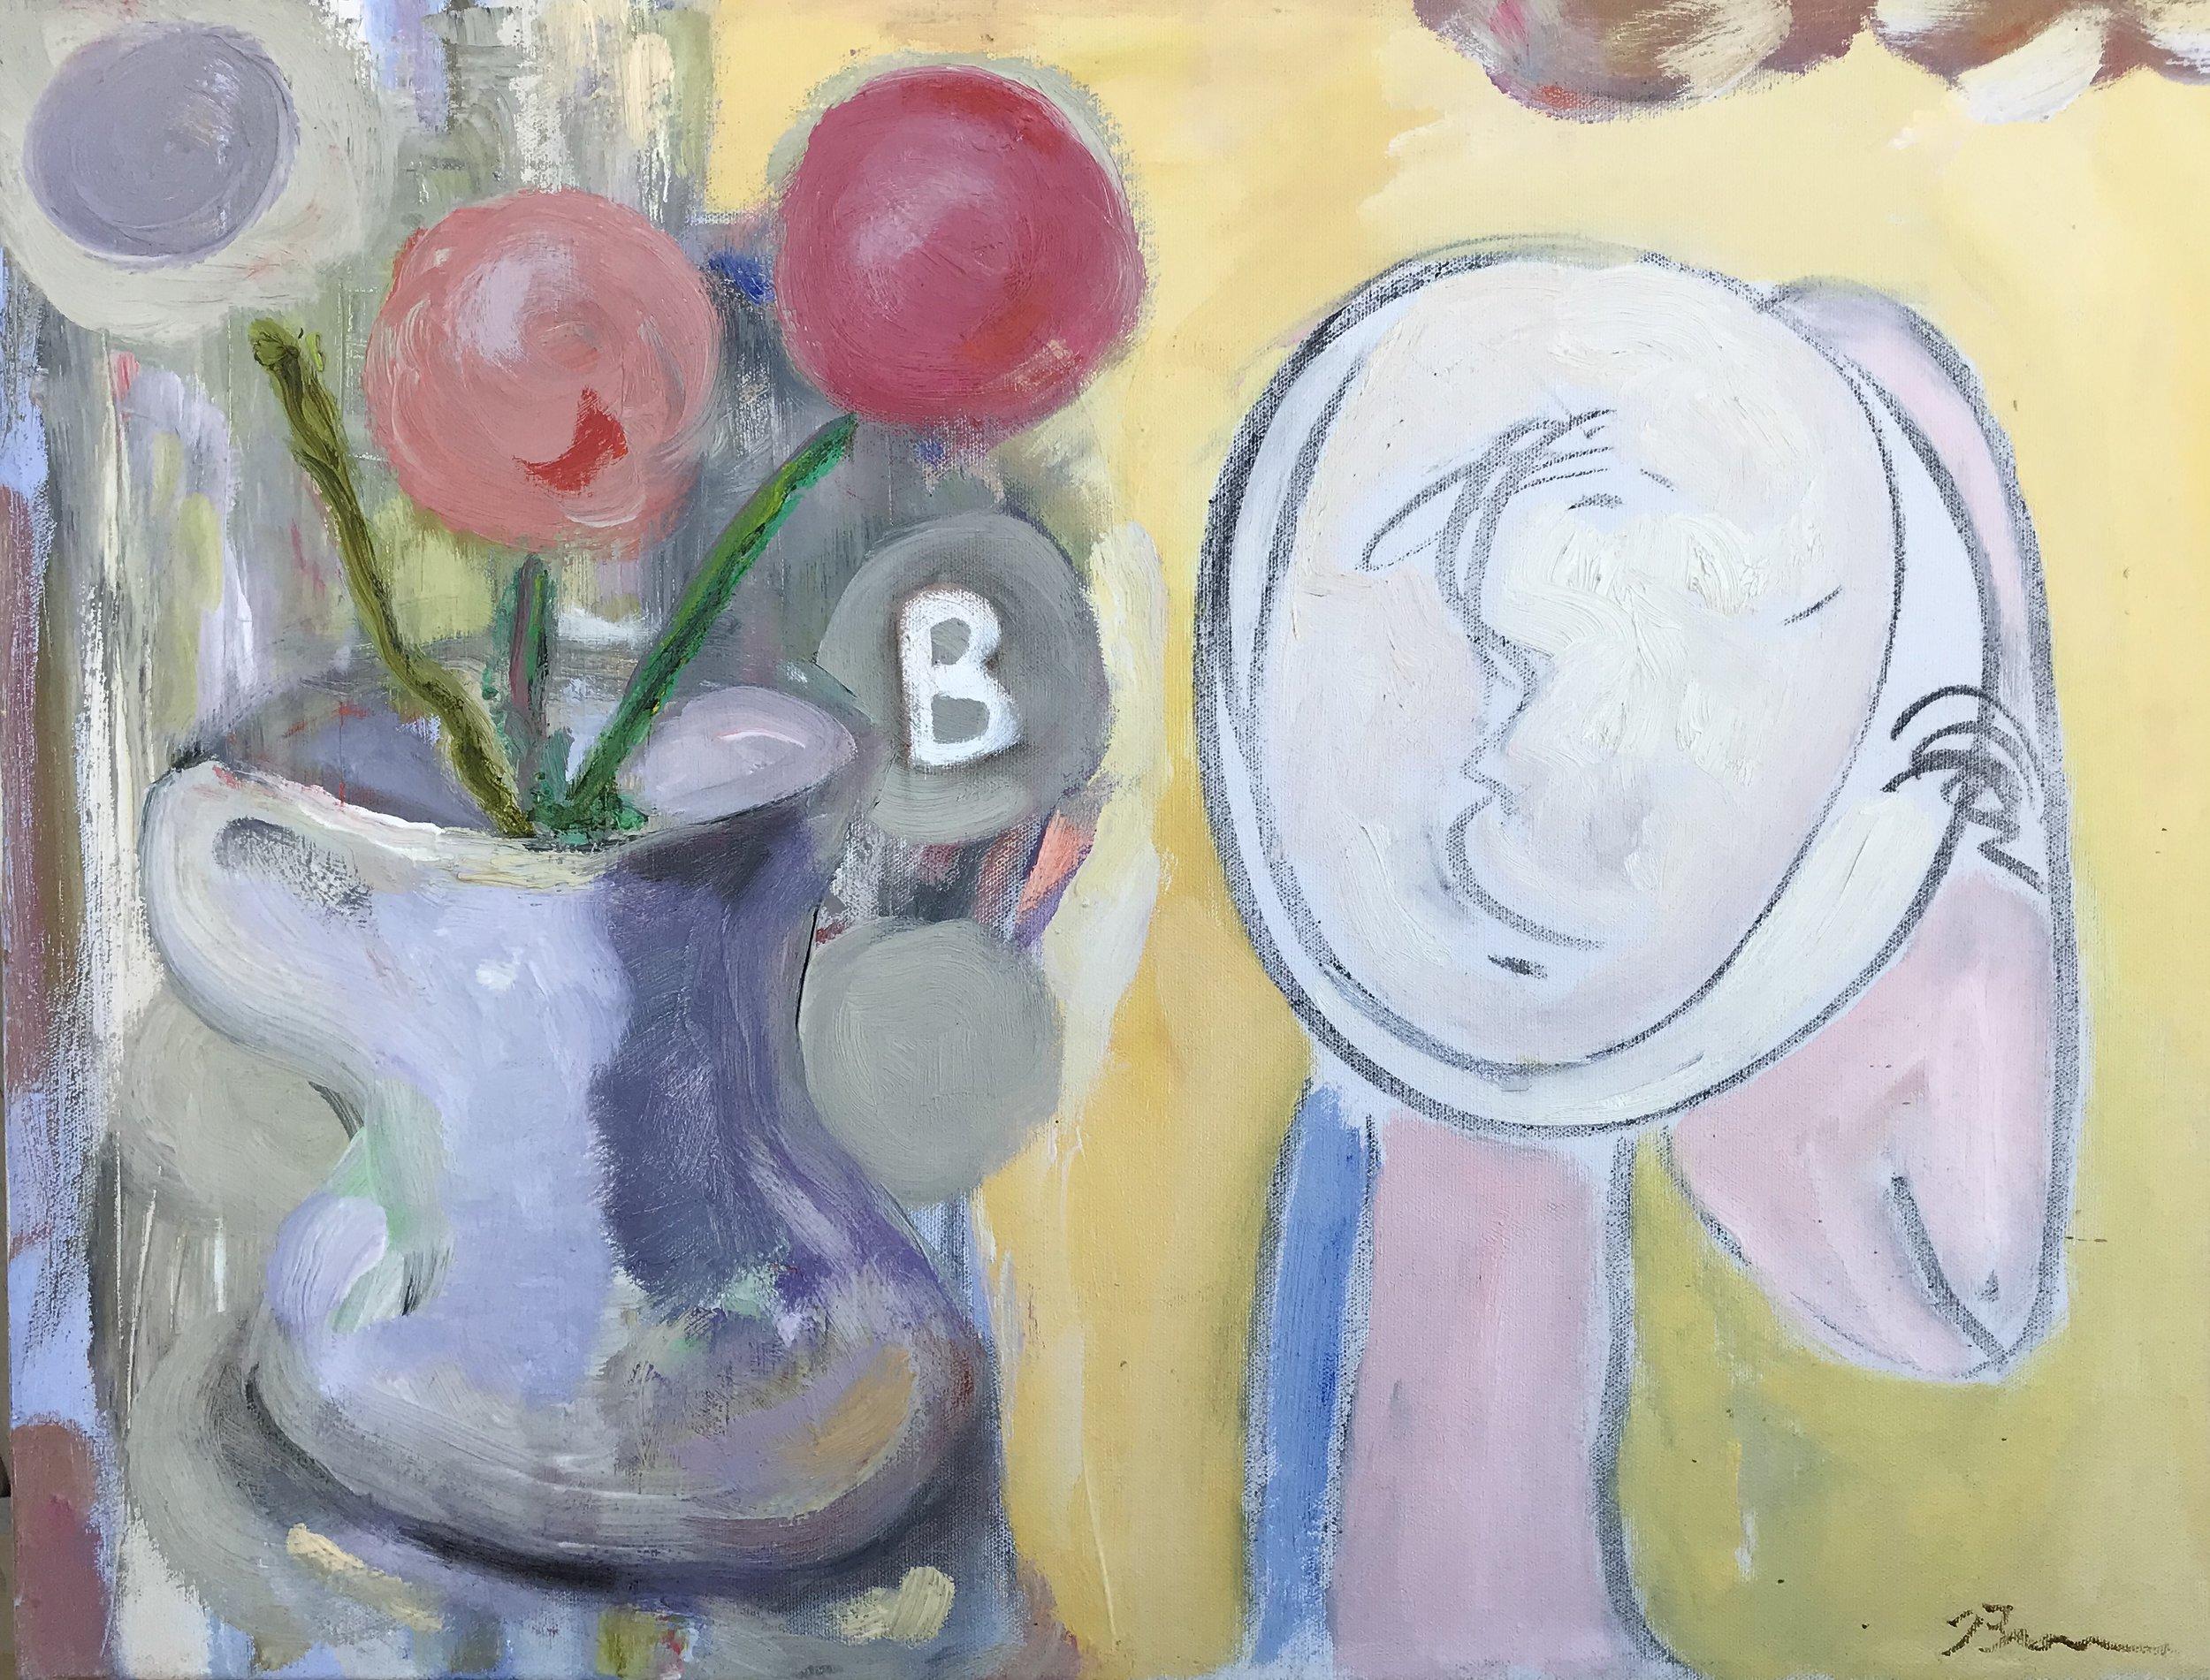 """Something Like a Dream"" - 18"" x 24"" x 1"", oil on canvasValue: $2,200Opening bid: $1,100email your bid to: art@bradfordbrenner.com"